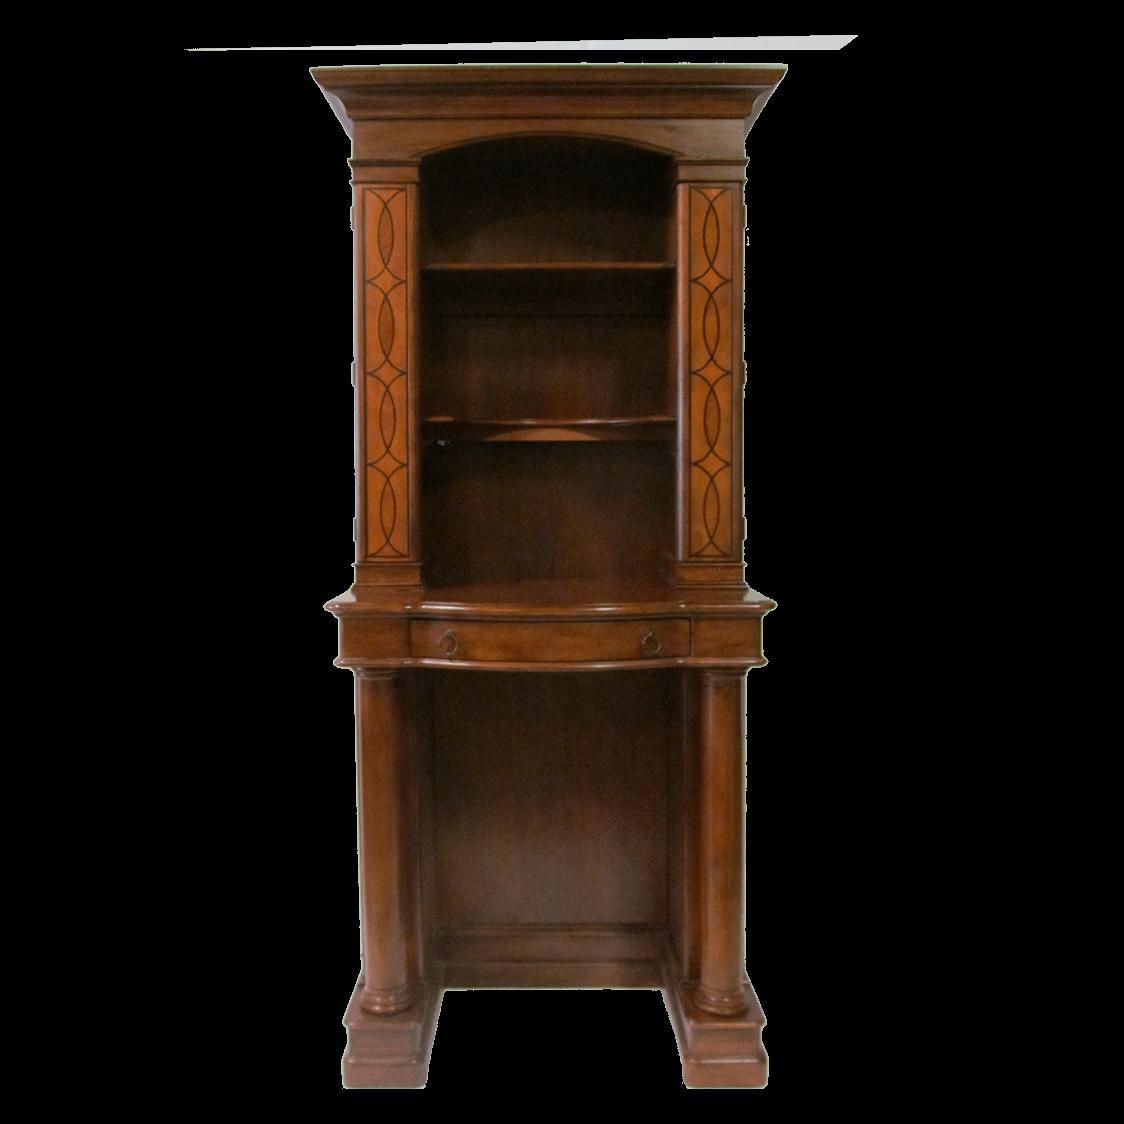 248908_Sligh_Furniture_Communication_Center